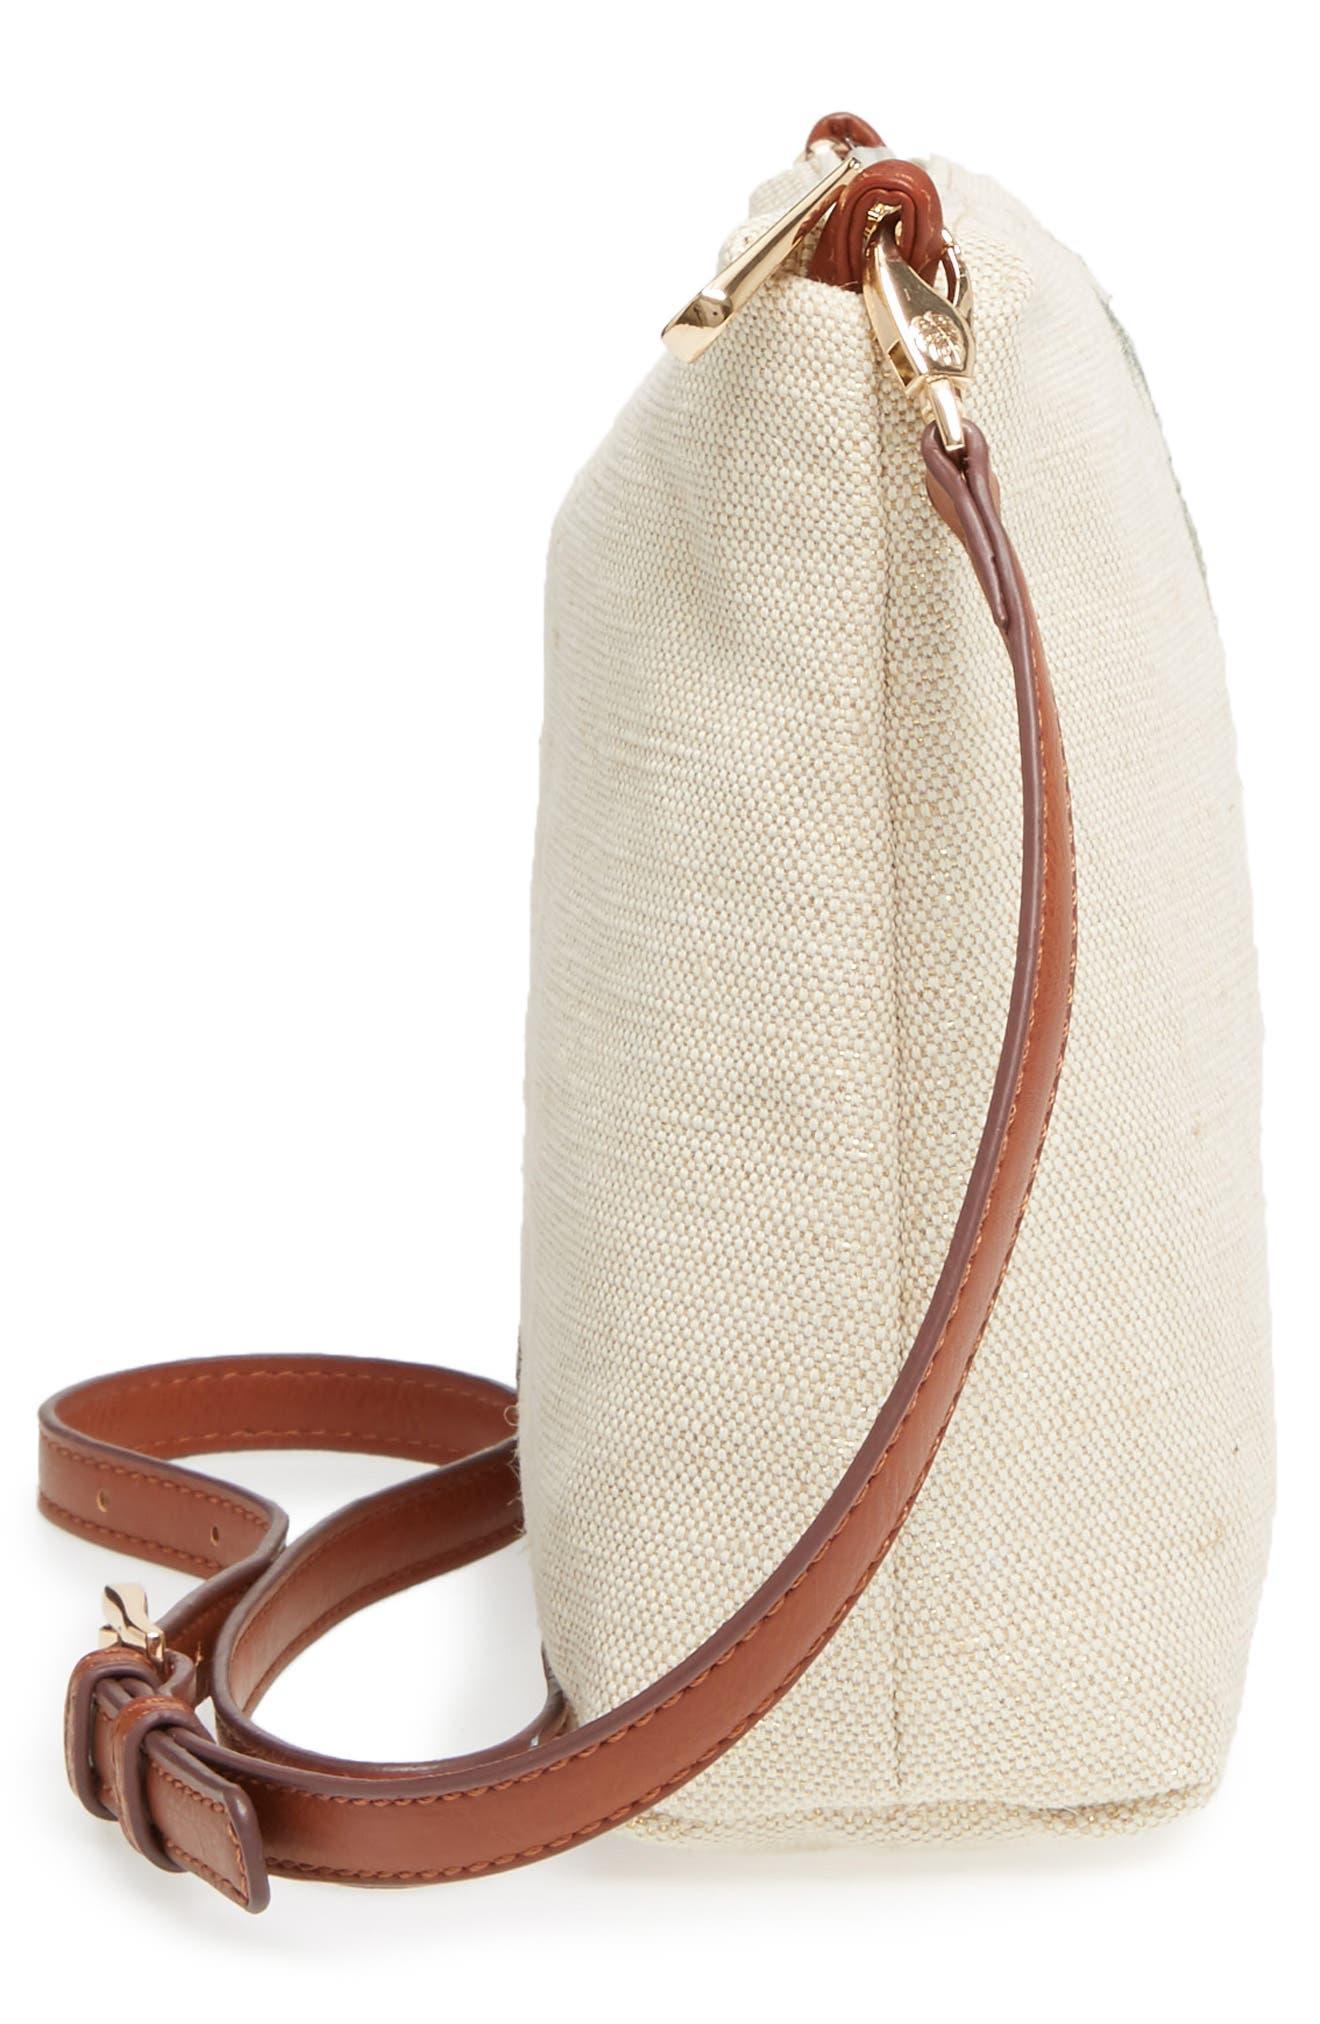 La Plancha Convertible Crossbody Bag,                             Alternate thumbnail 5, color,